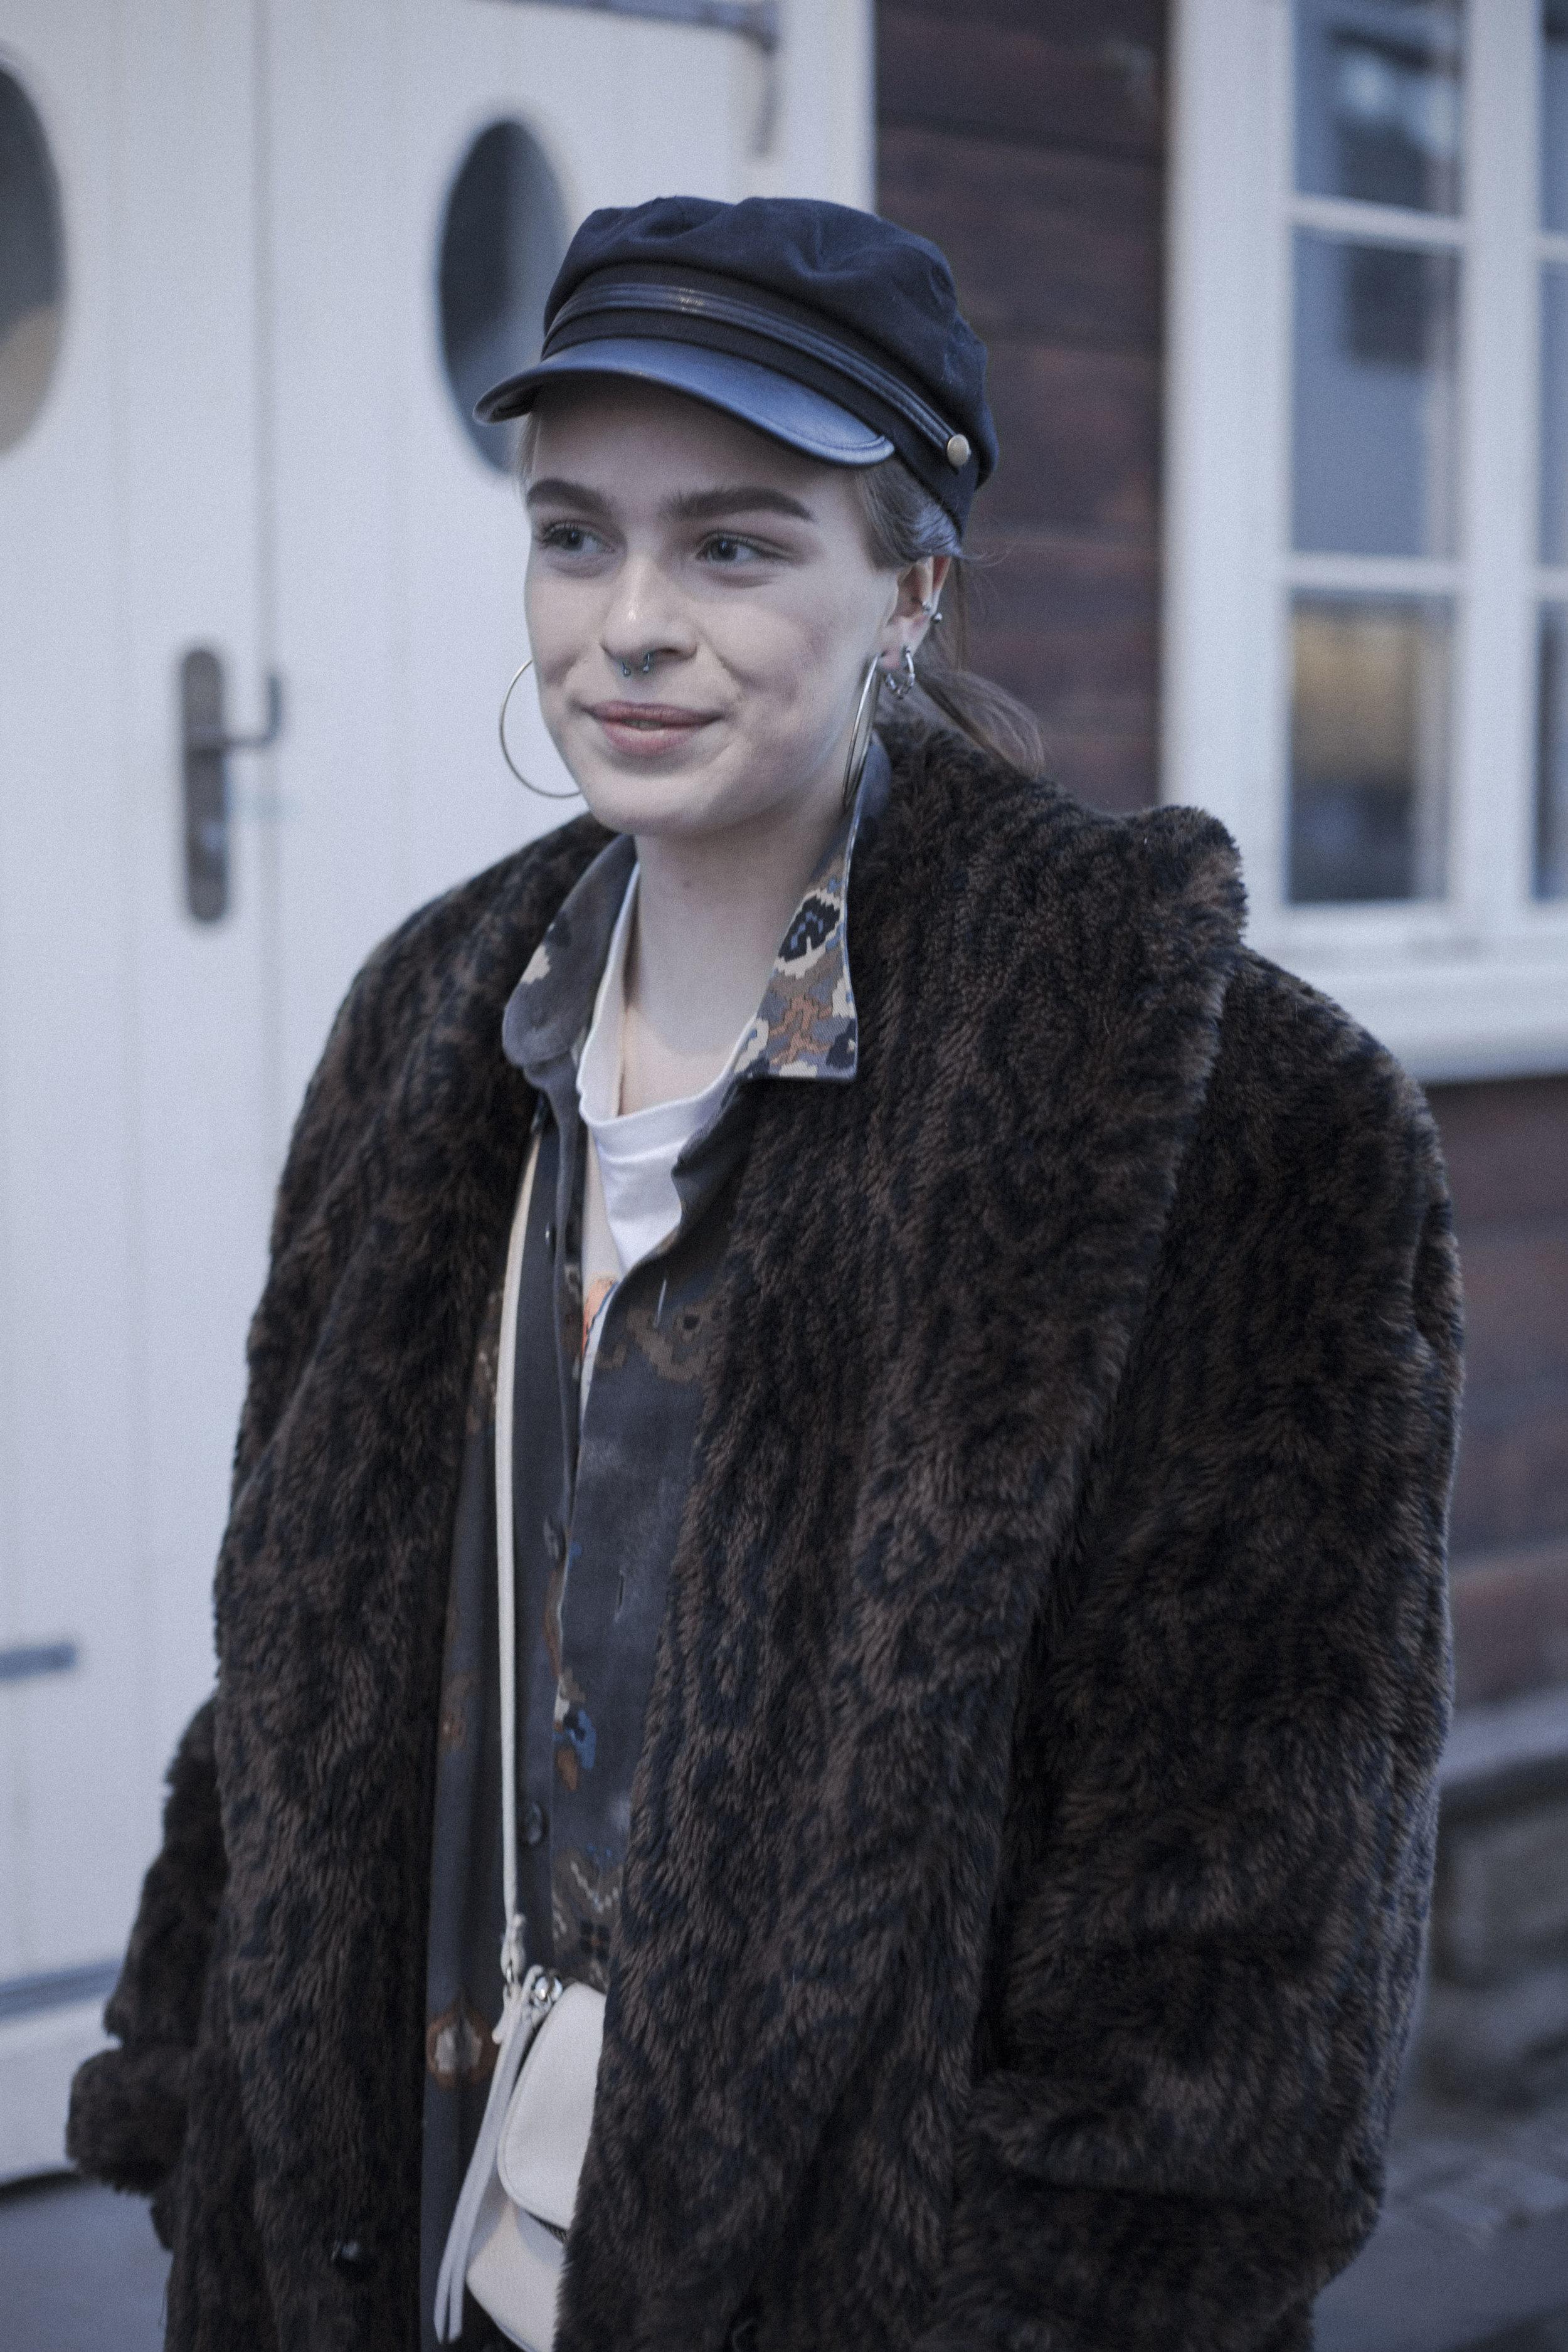 Reykjaivk-fashion-streetstyle-blog-onthestreets-thestreetland-portraits-fashionweek-layering-style-